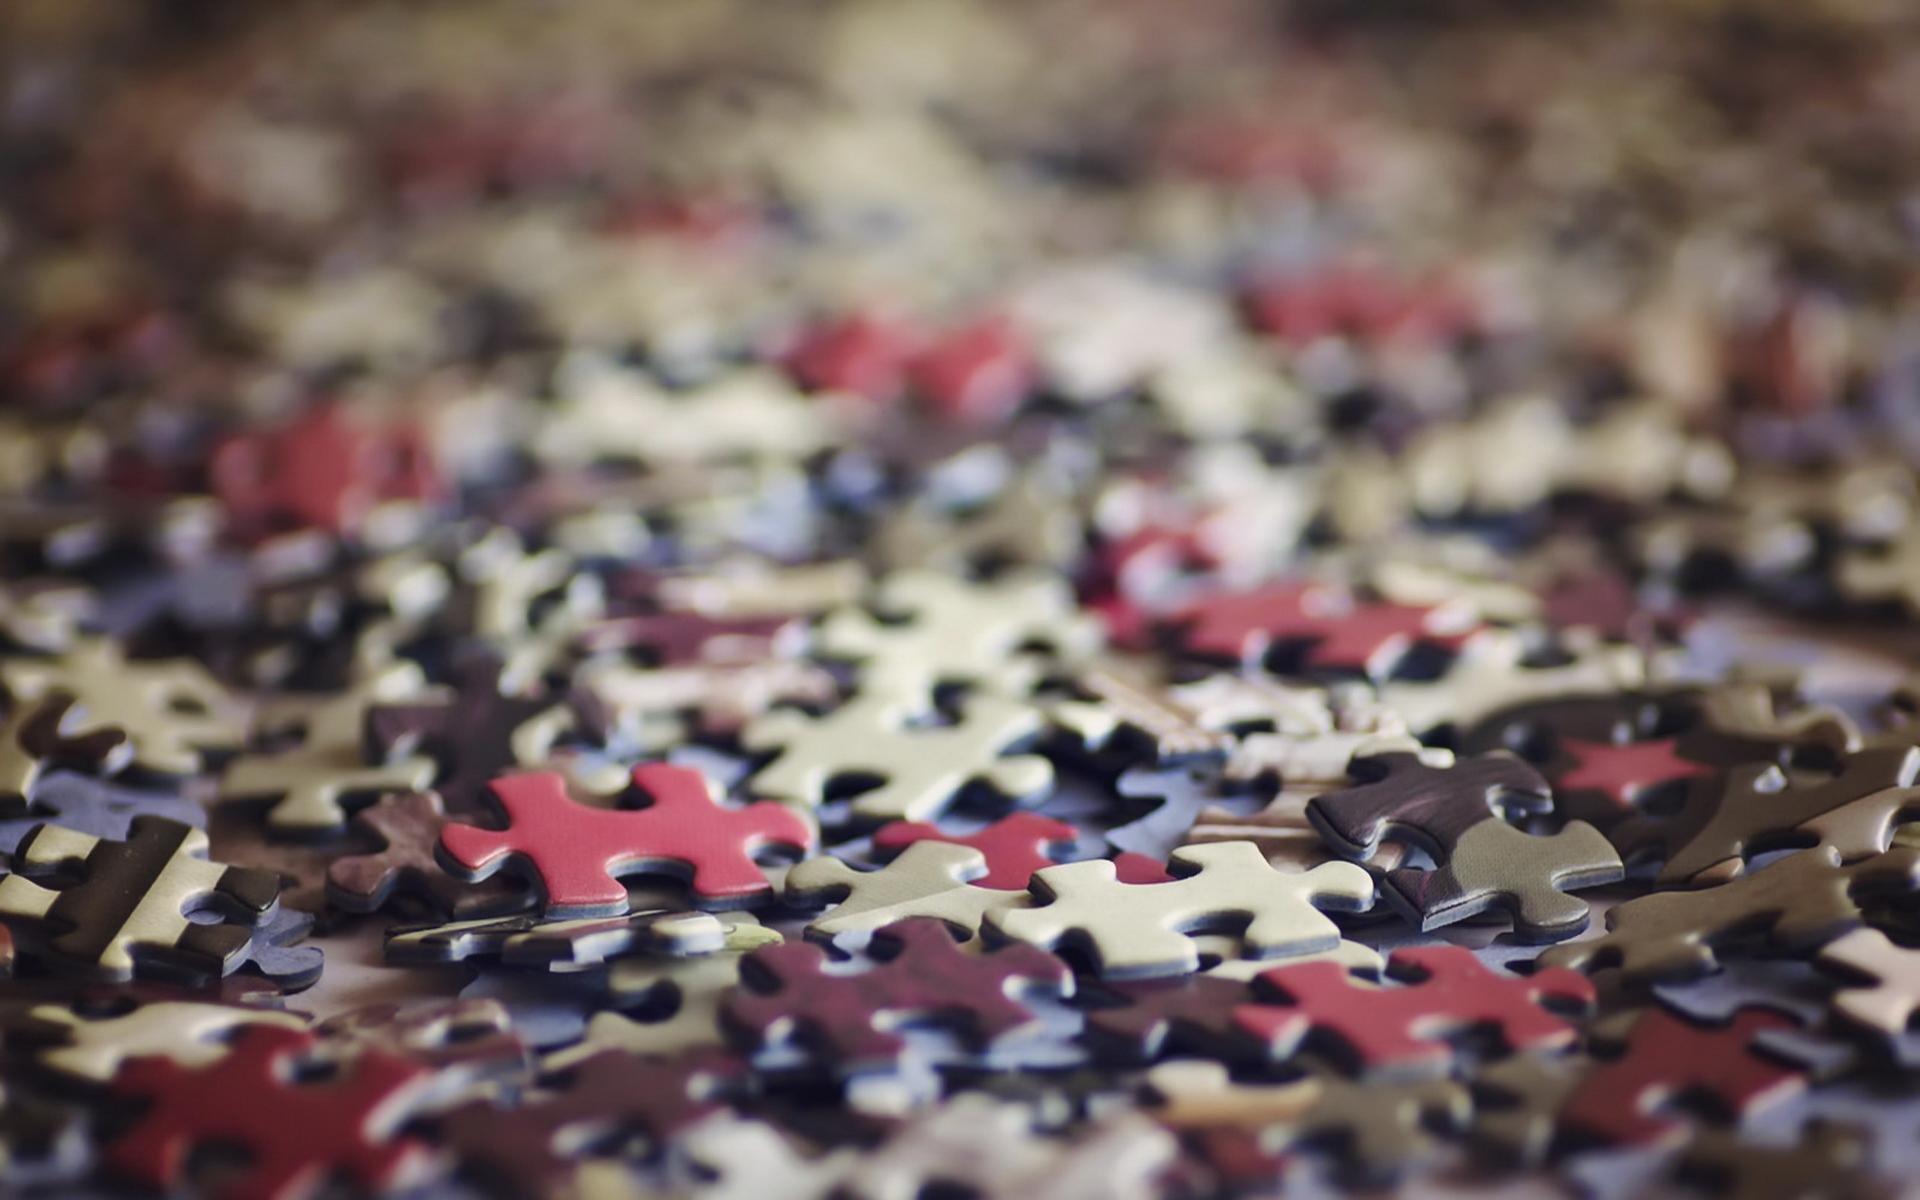 puzzle pieces hd wallpaper 68370